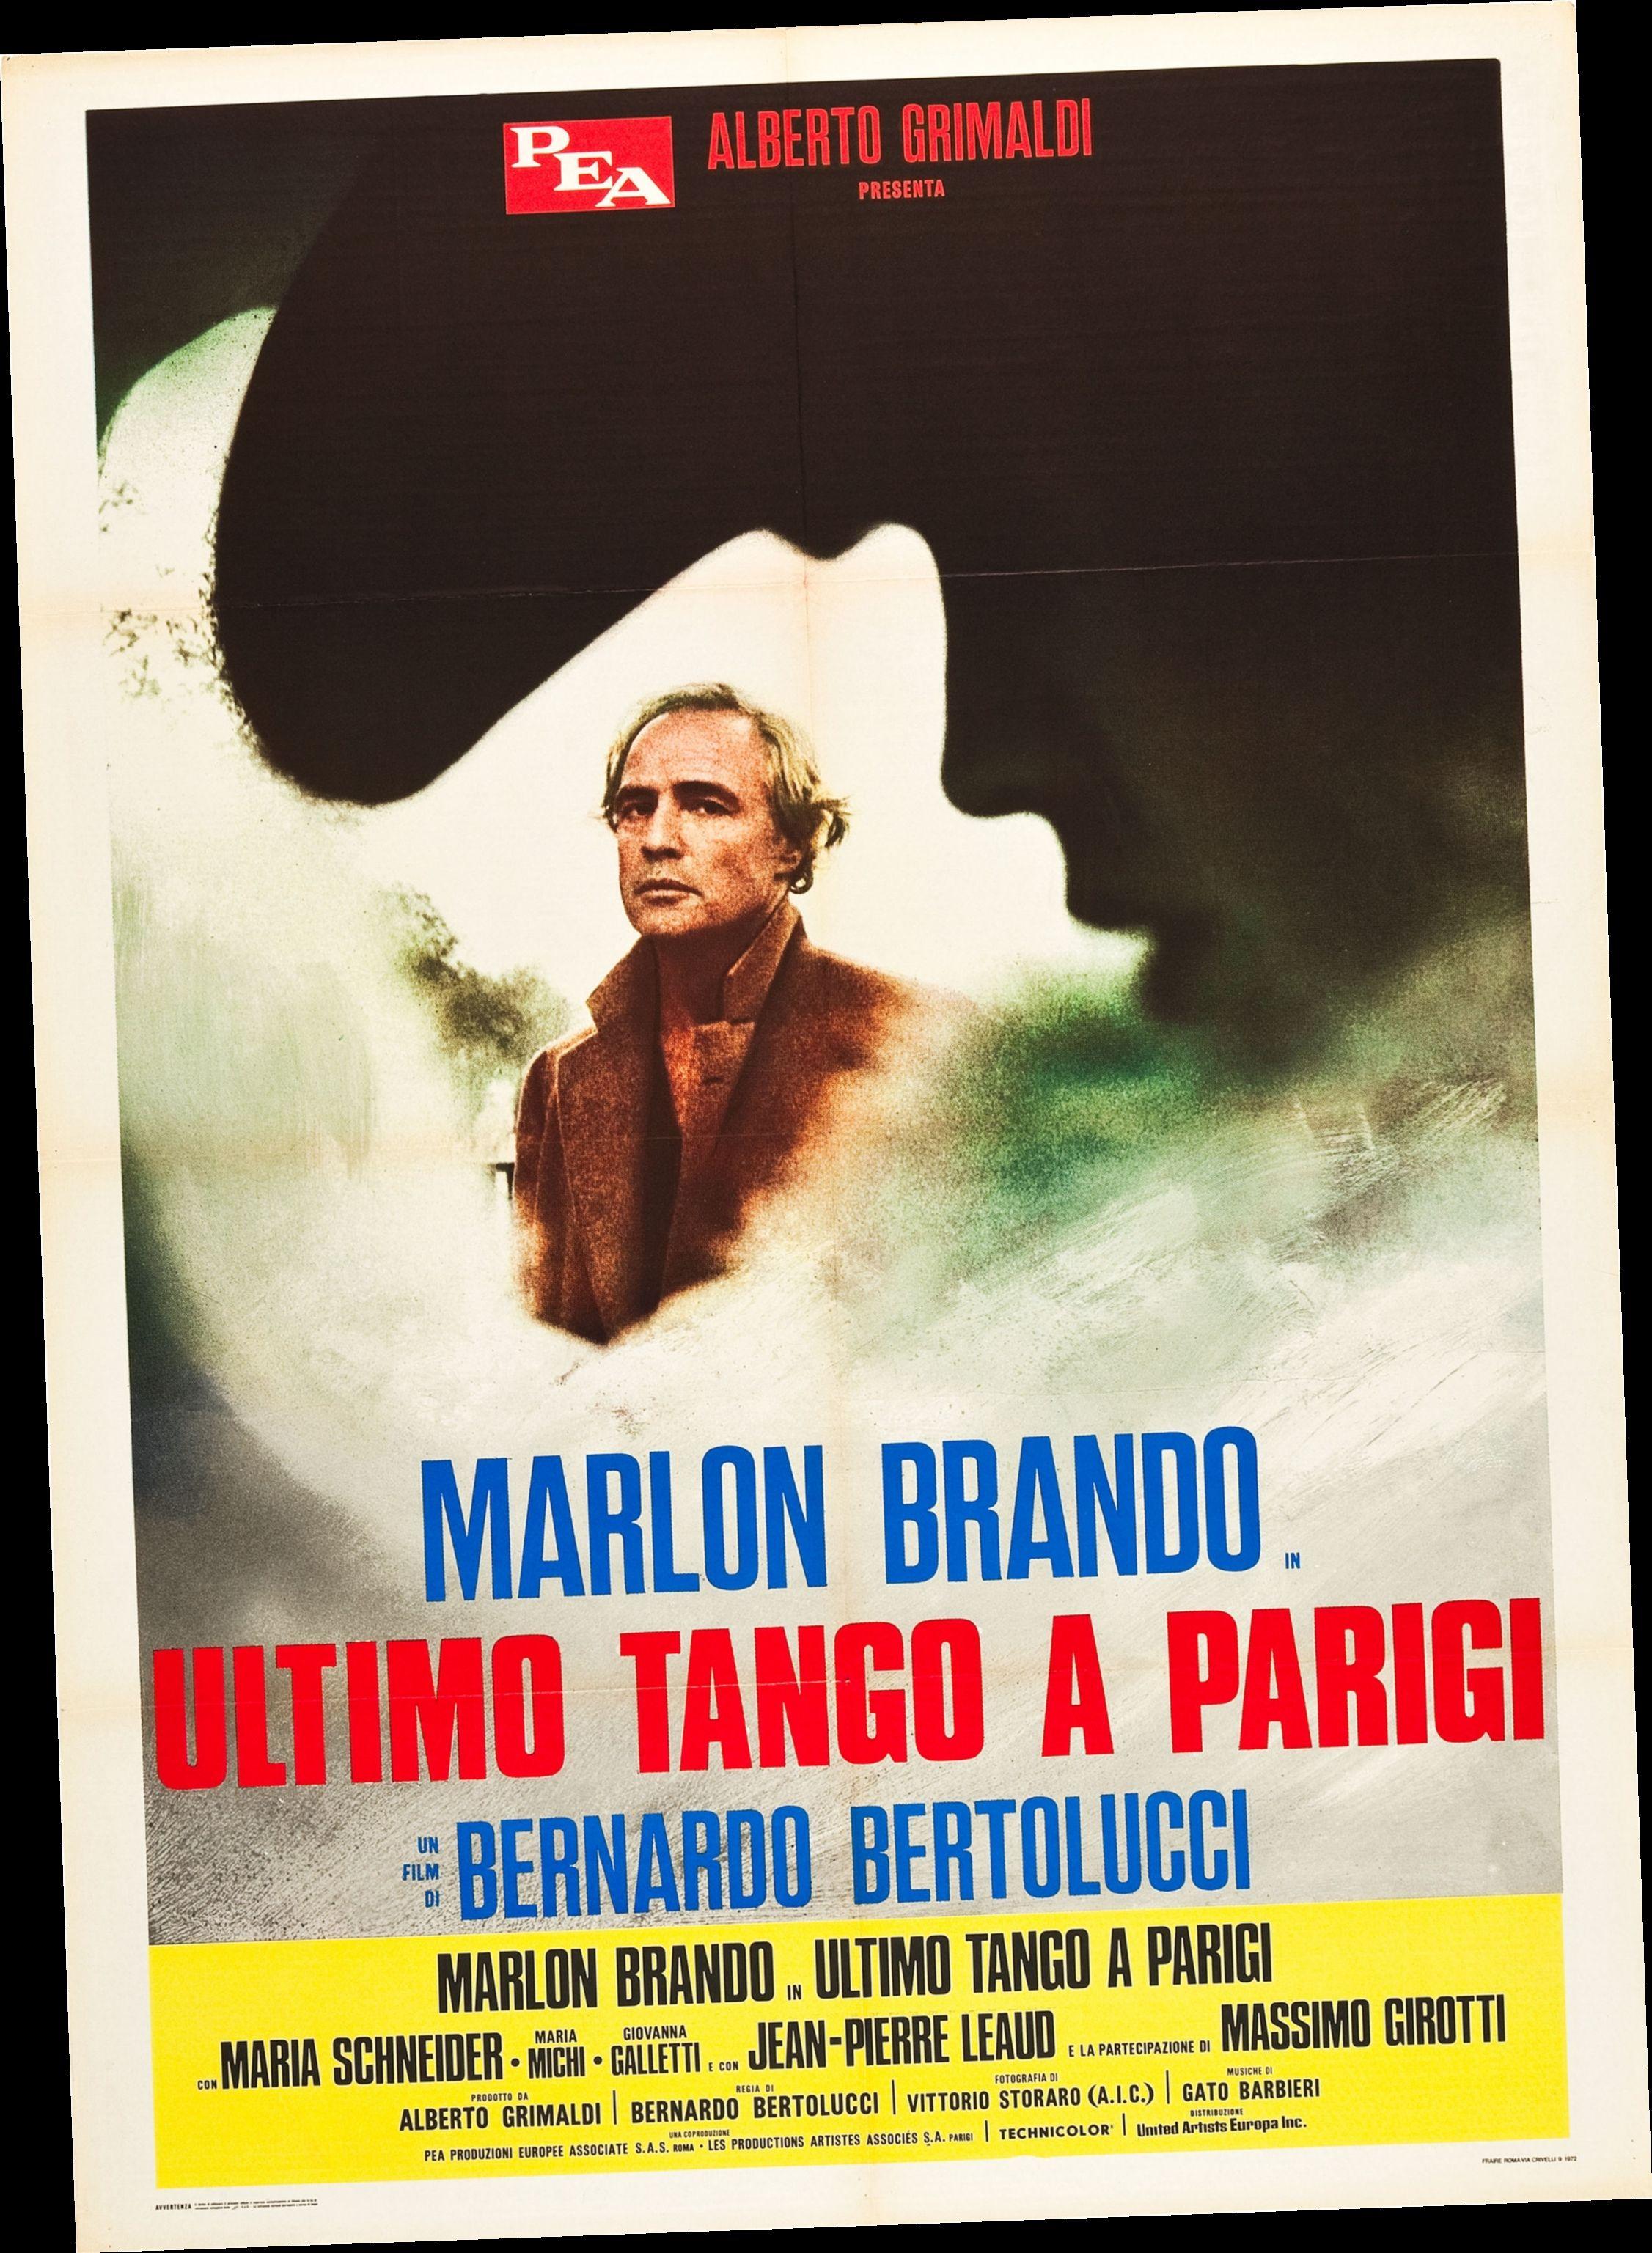 Ultimo Tango A Parigi Film Completo Hd Streaming Italiano Poster Filma Tango Filmy